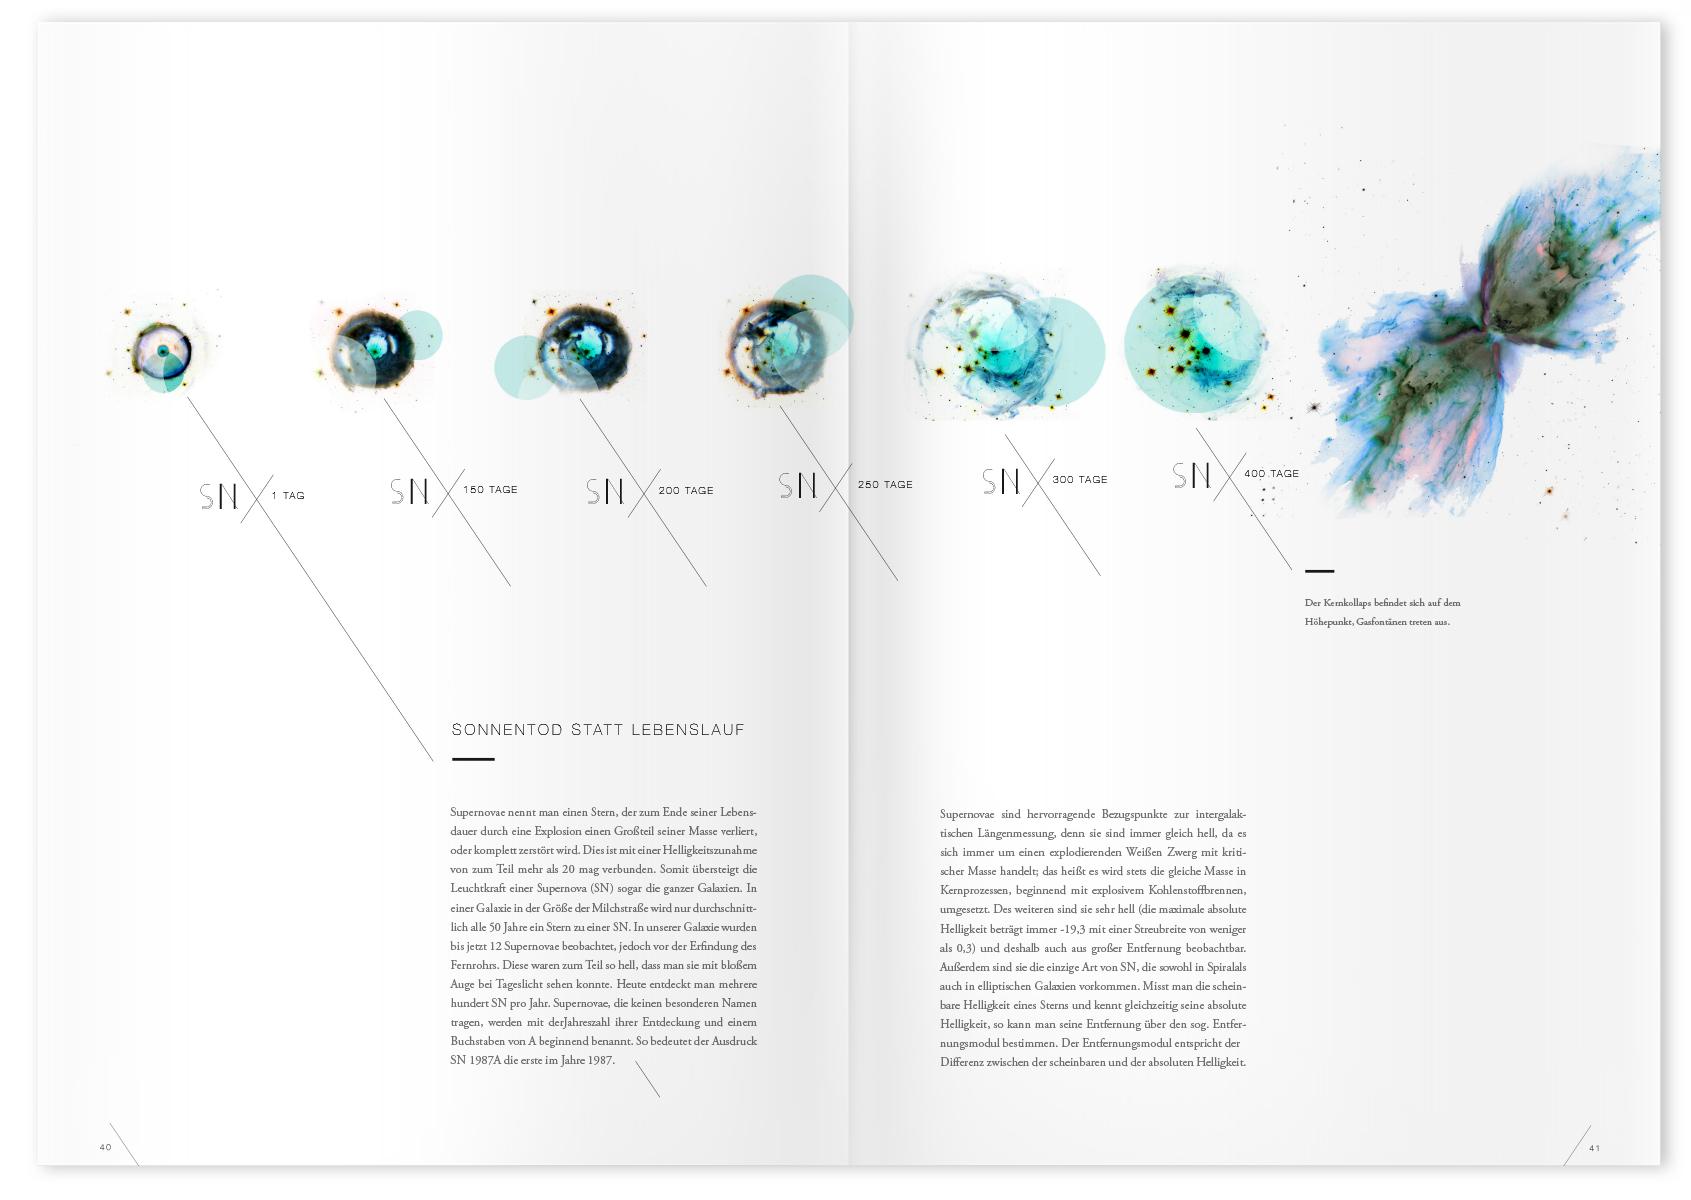 09_Cosmos-Magazin_hsrm-Hochschule-RheinMain_Editorial-Design_Grafikdesign_Gloria-Kison.jpg